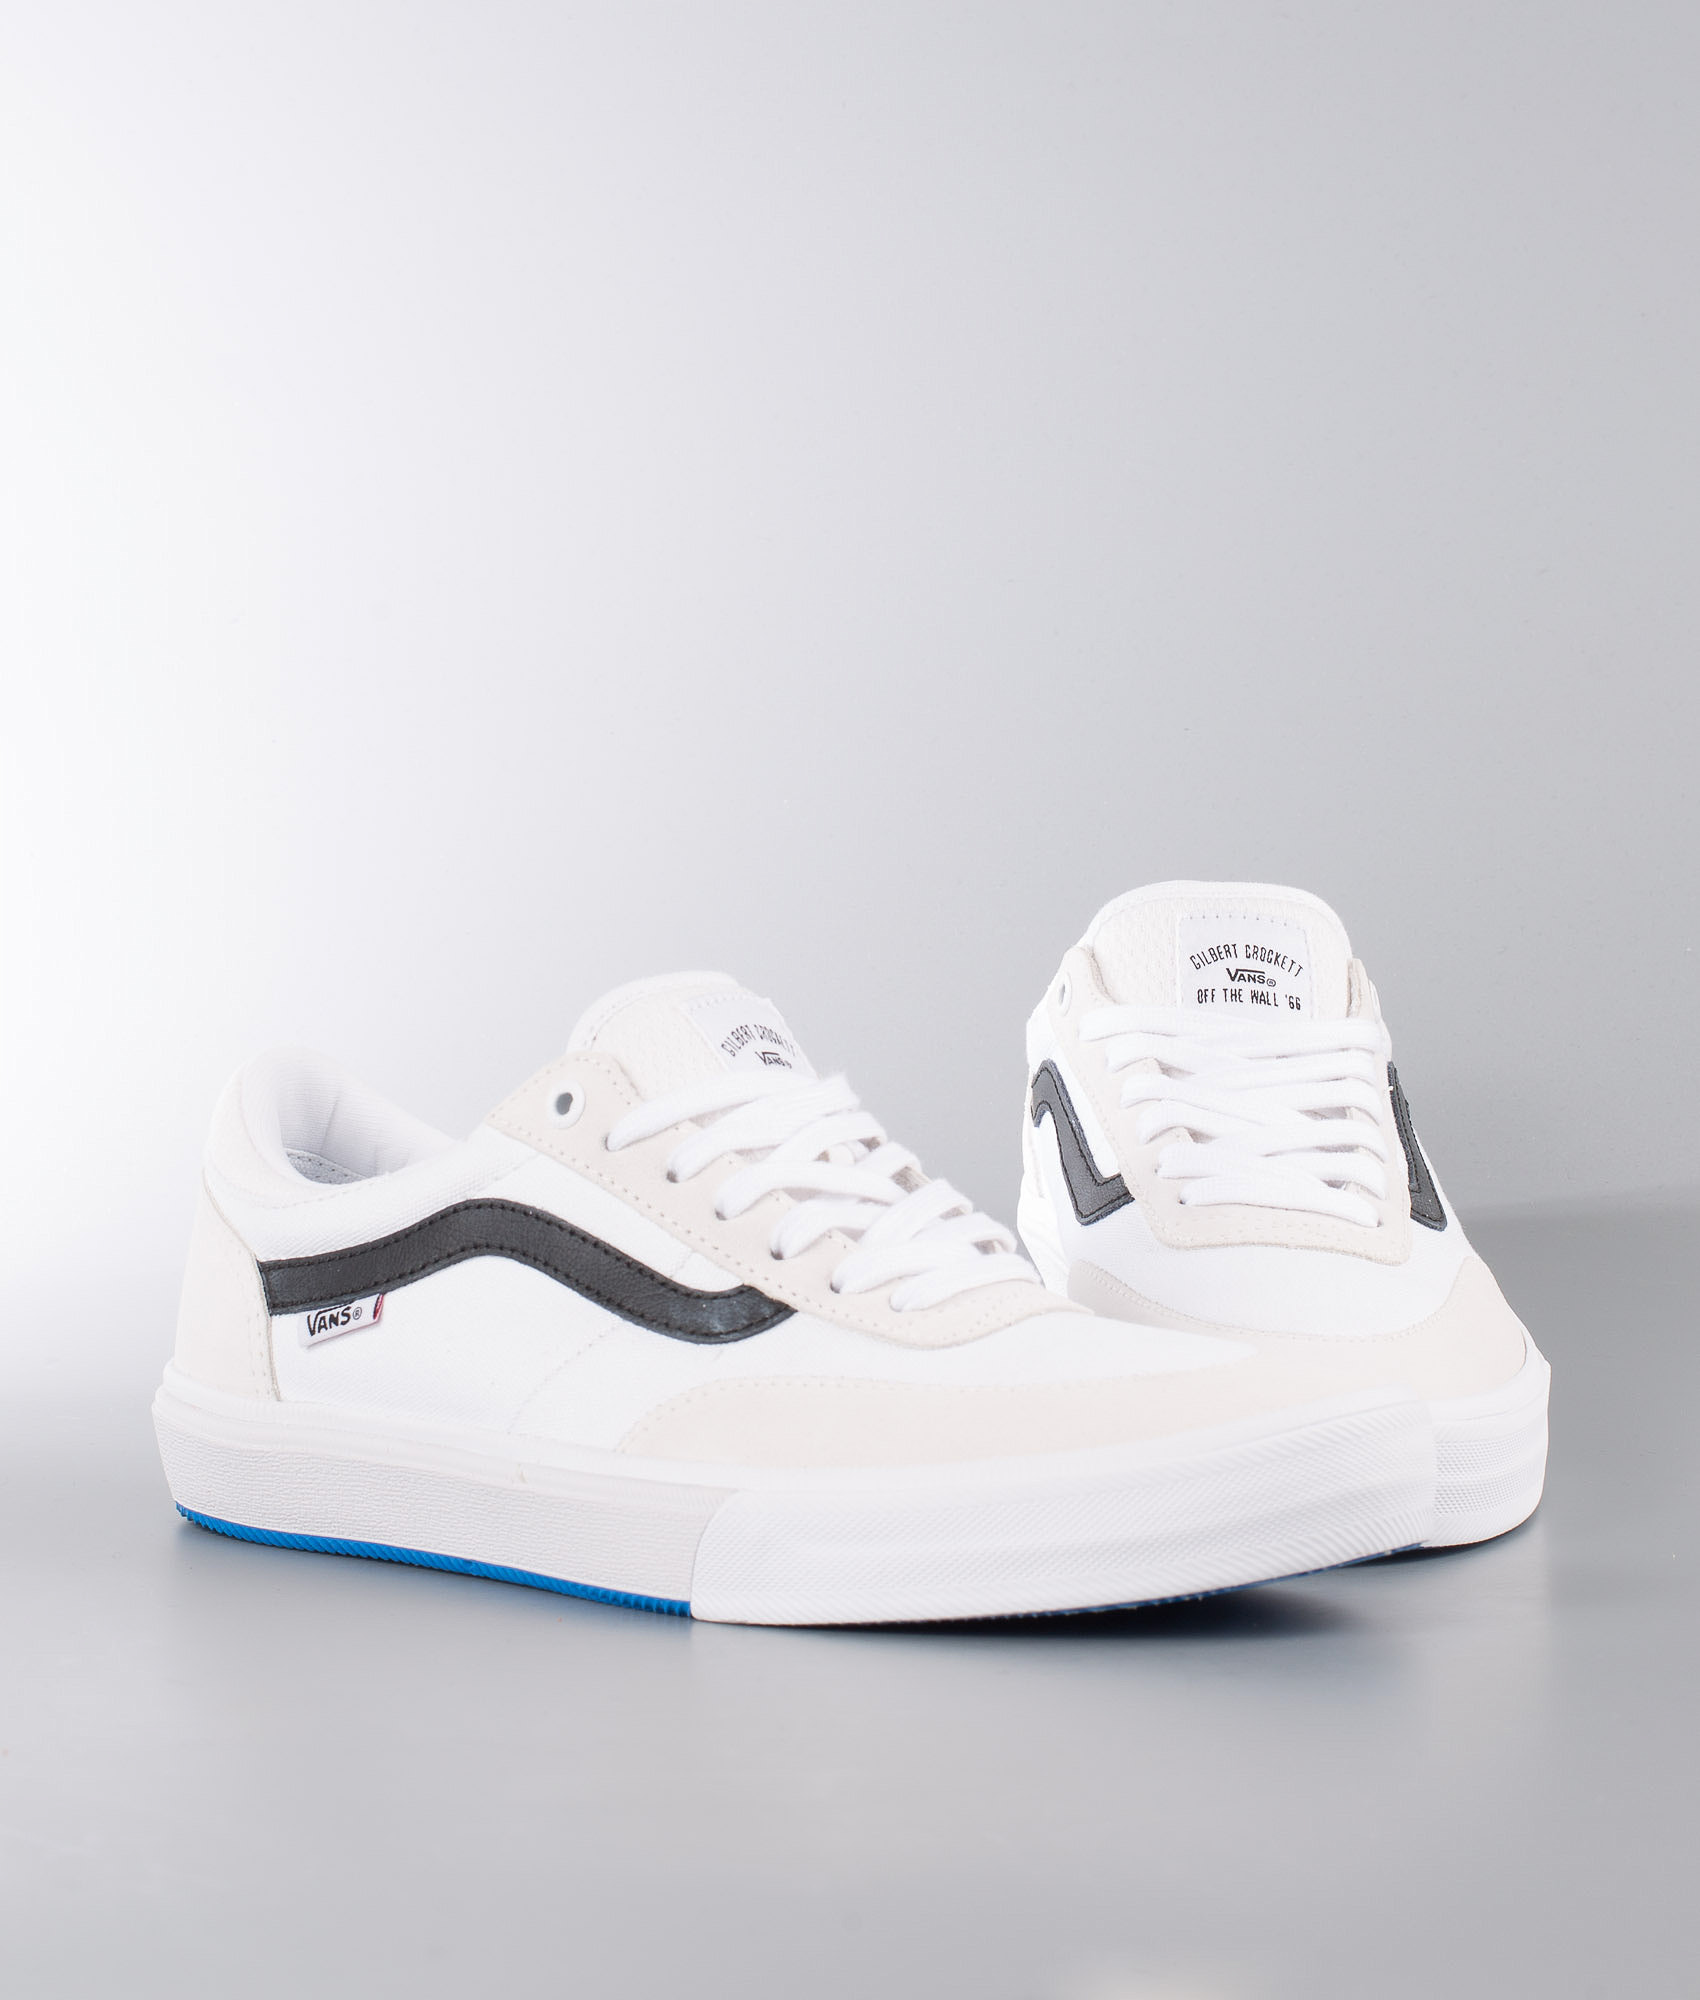 Vans Gilbert Crockett 2 Pro Shoes True White Black - Ridestore.com d8525b8de32e